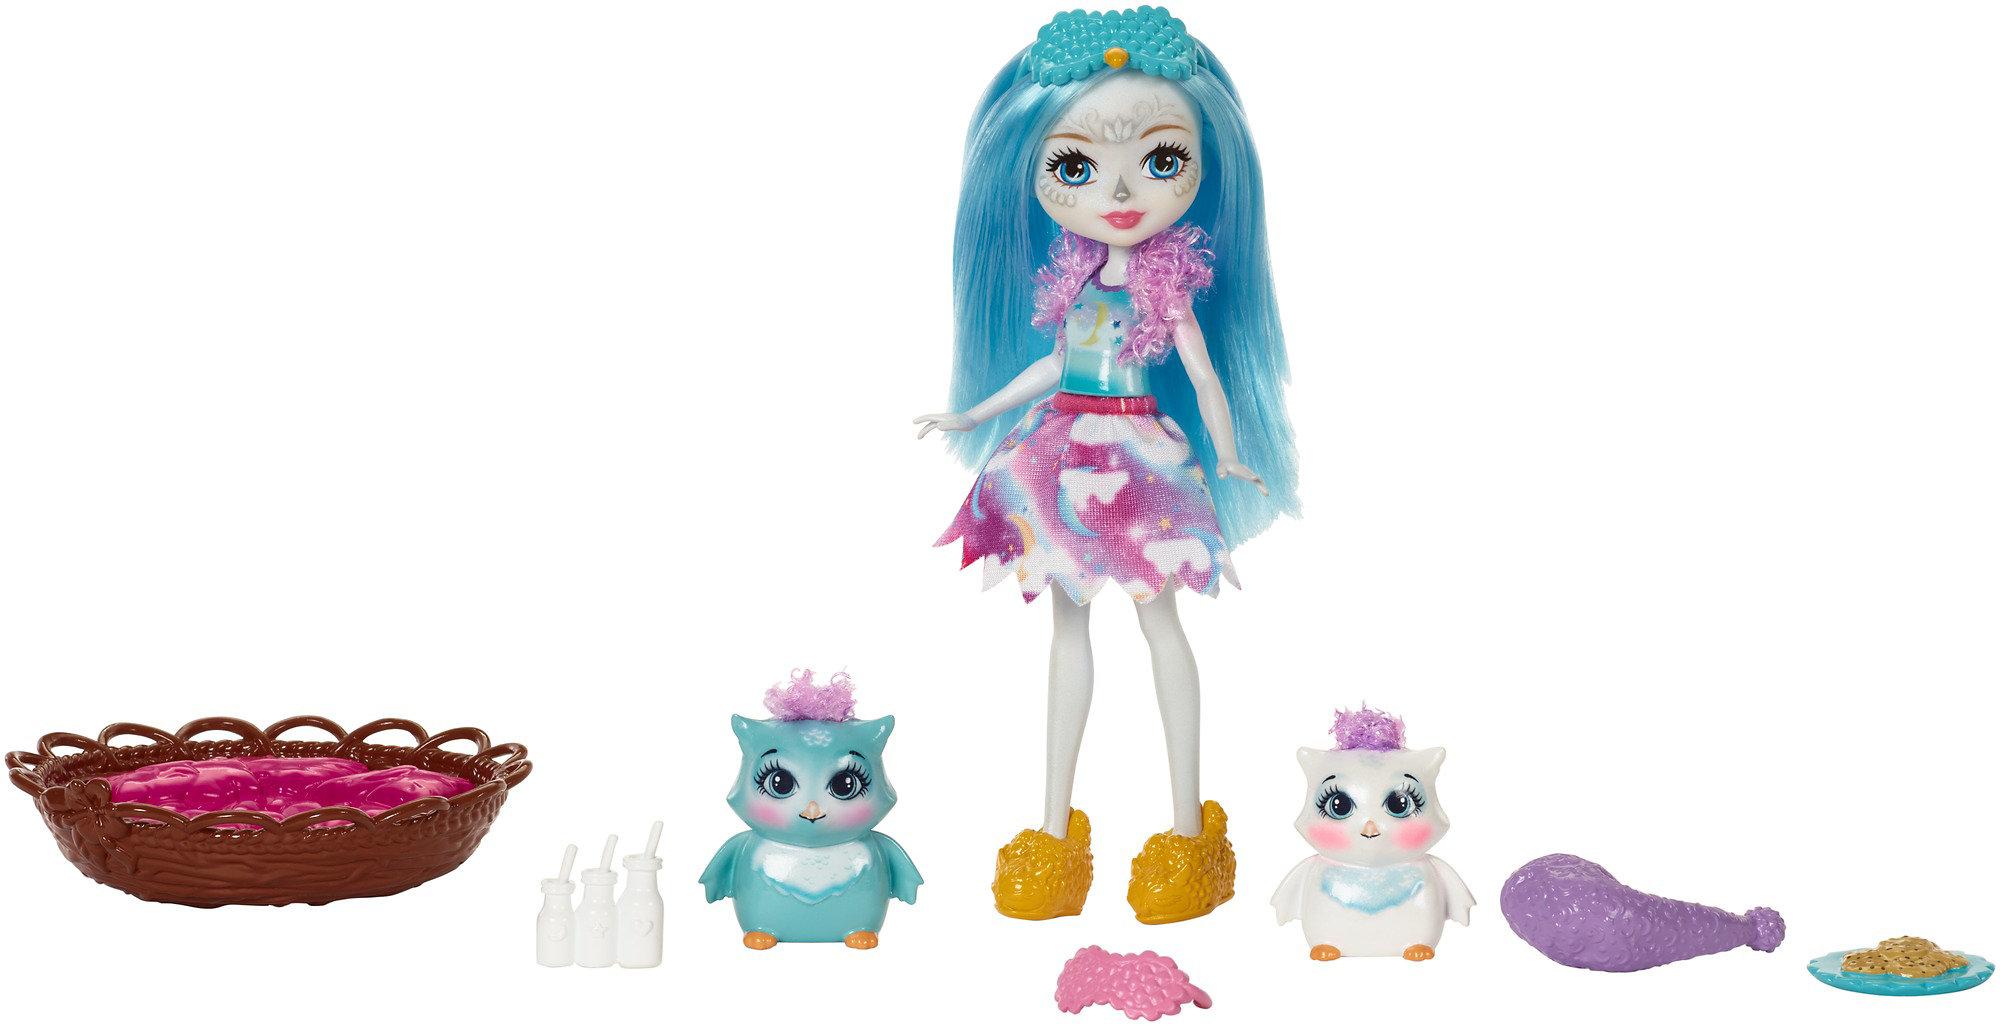 Enchantimals Sleepover Night Owl Dolls by Mattel